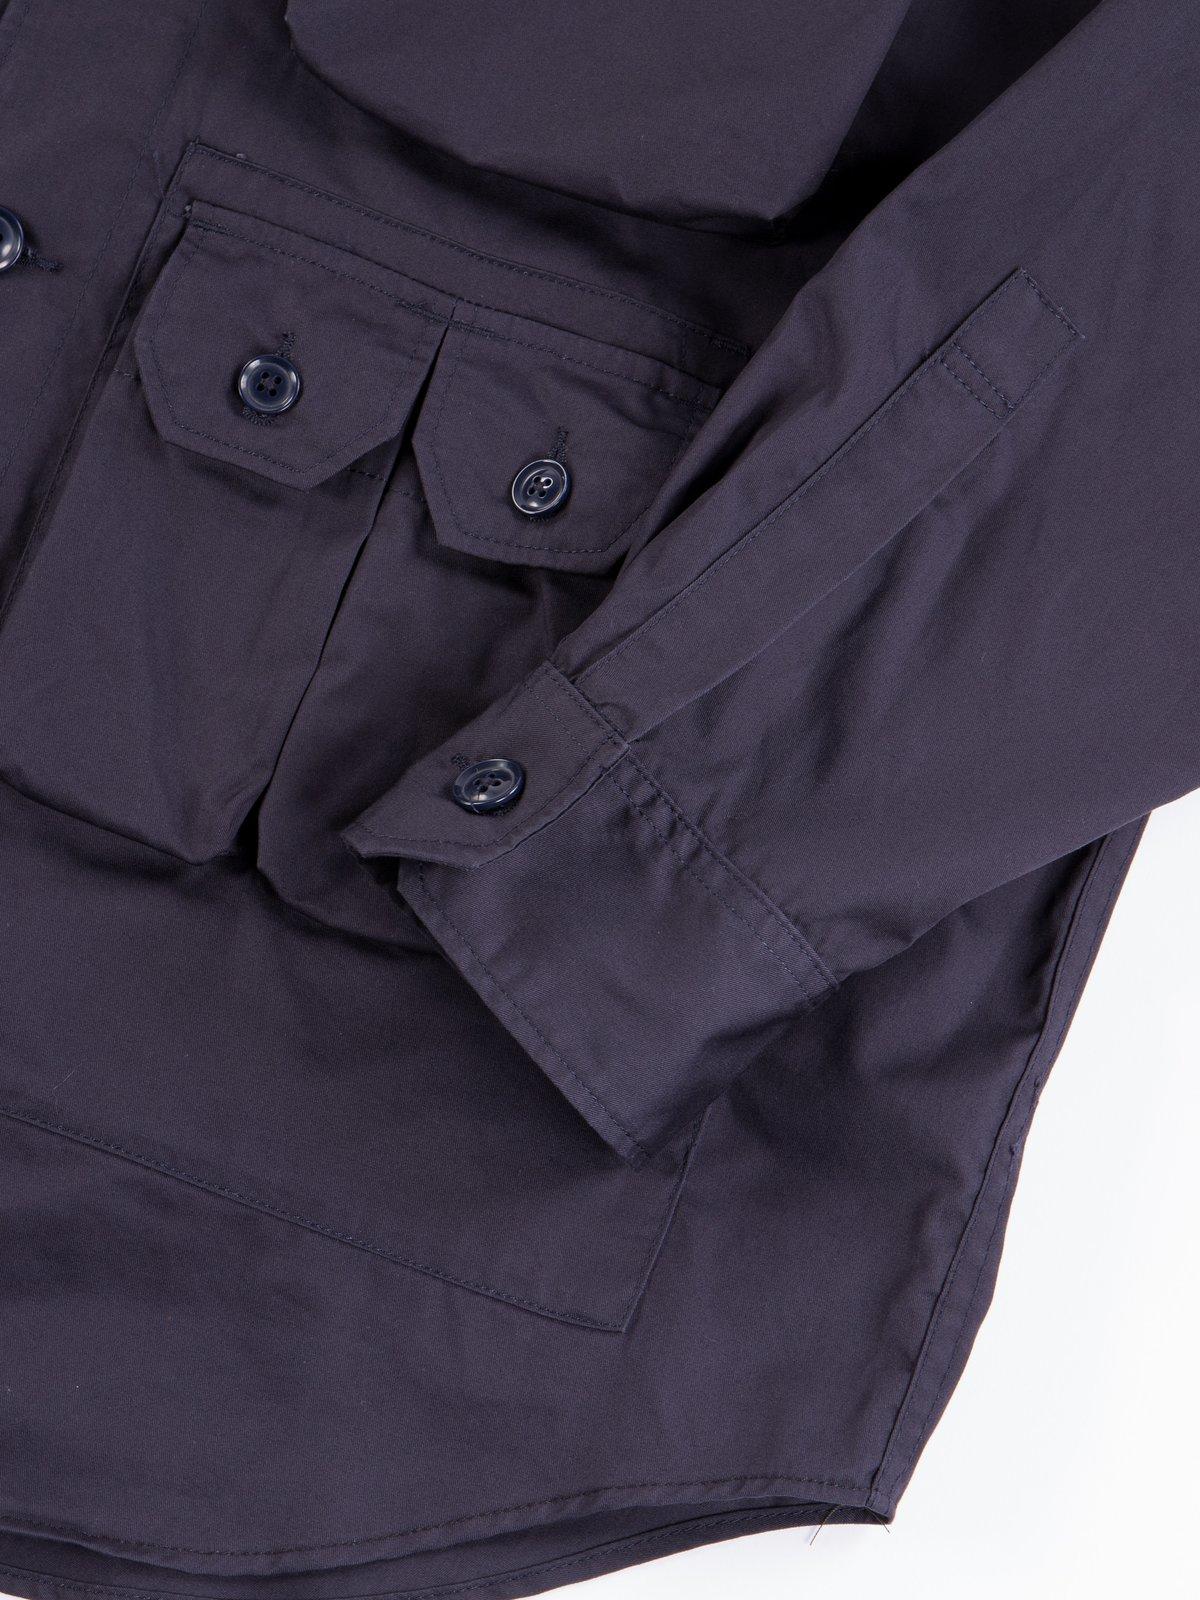 Dark Navy Highcount Twill Explorer Shirt Jacket - Image 6